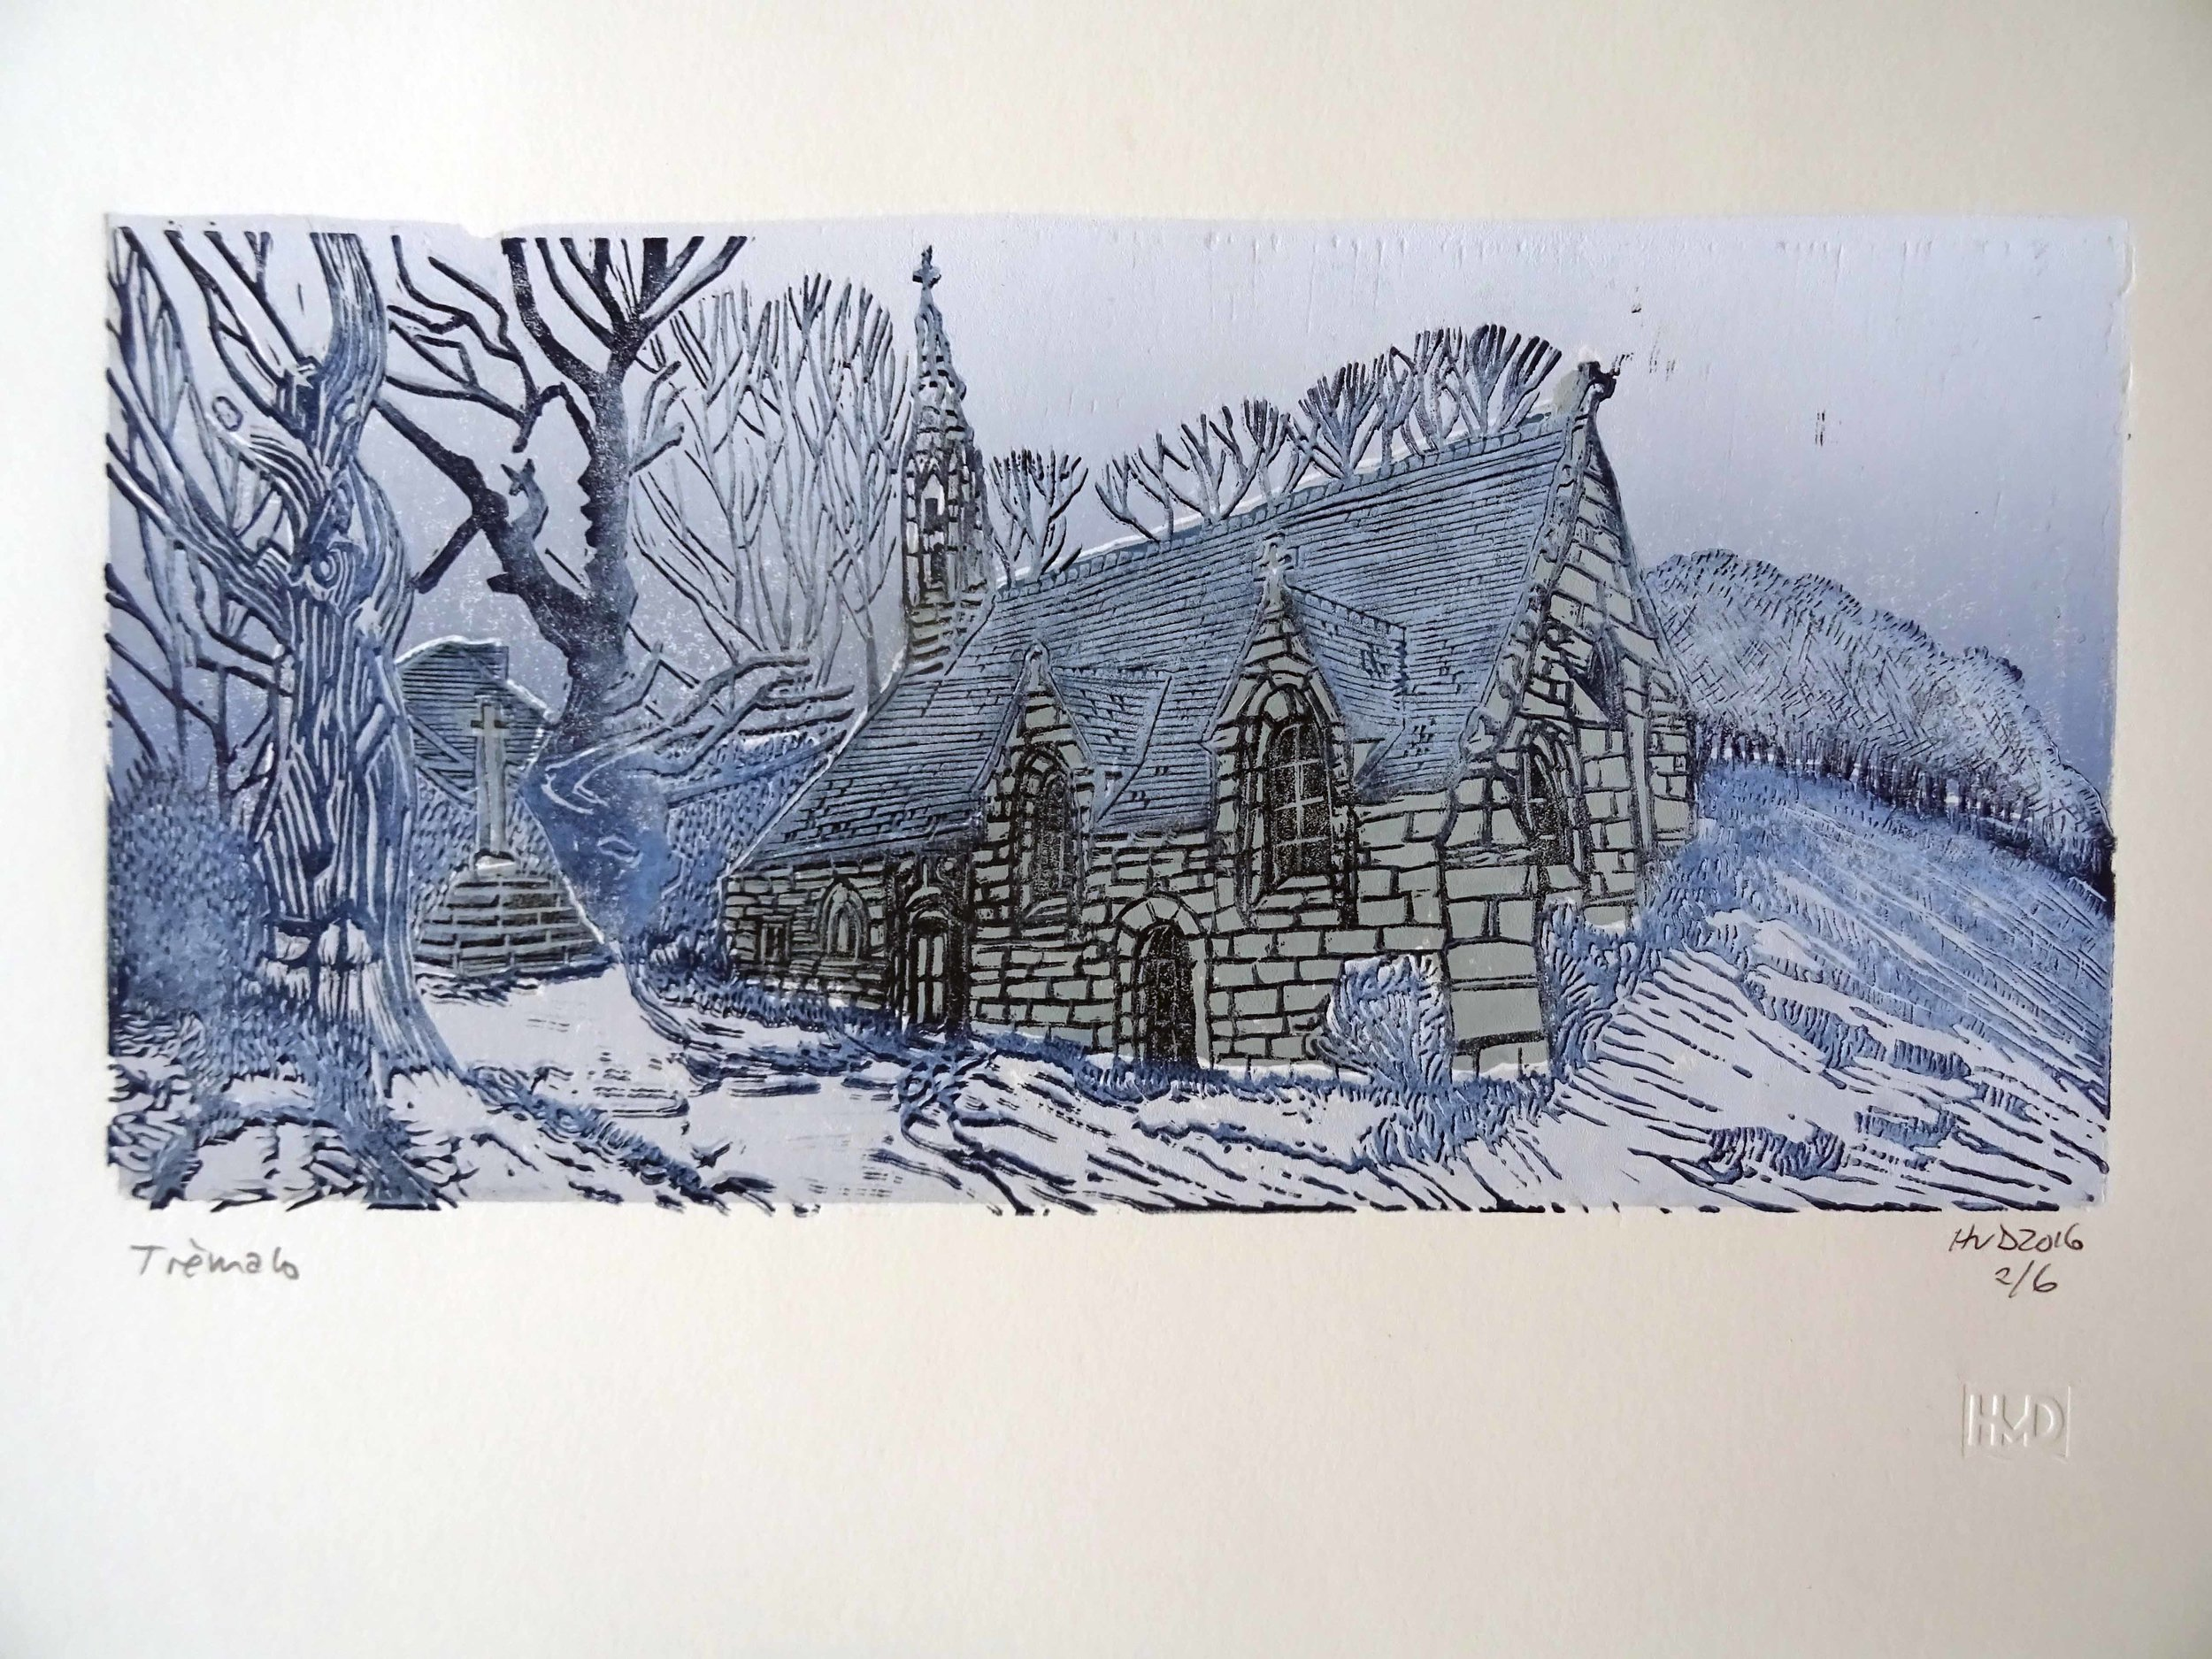 210 A - chapelllede Trémalo, winter, 3-plate lno 15x30 cm, 70 €